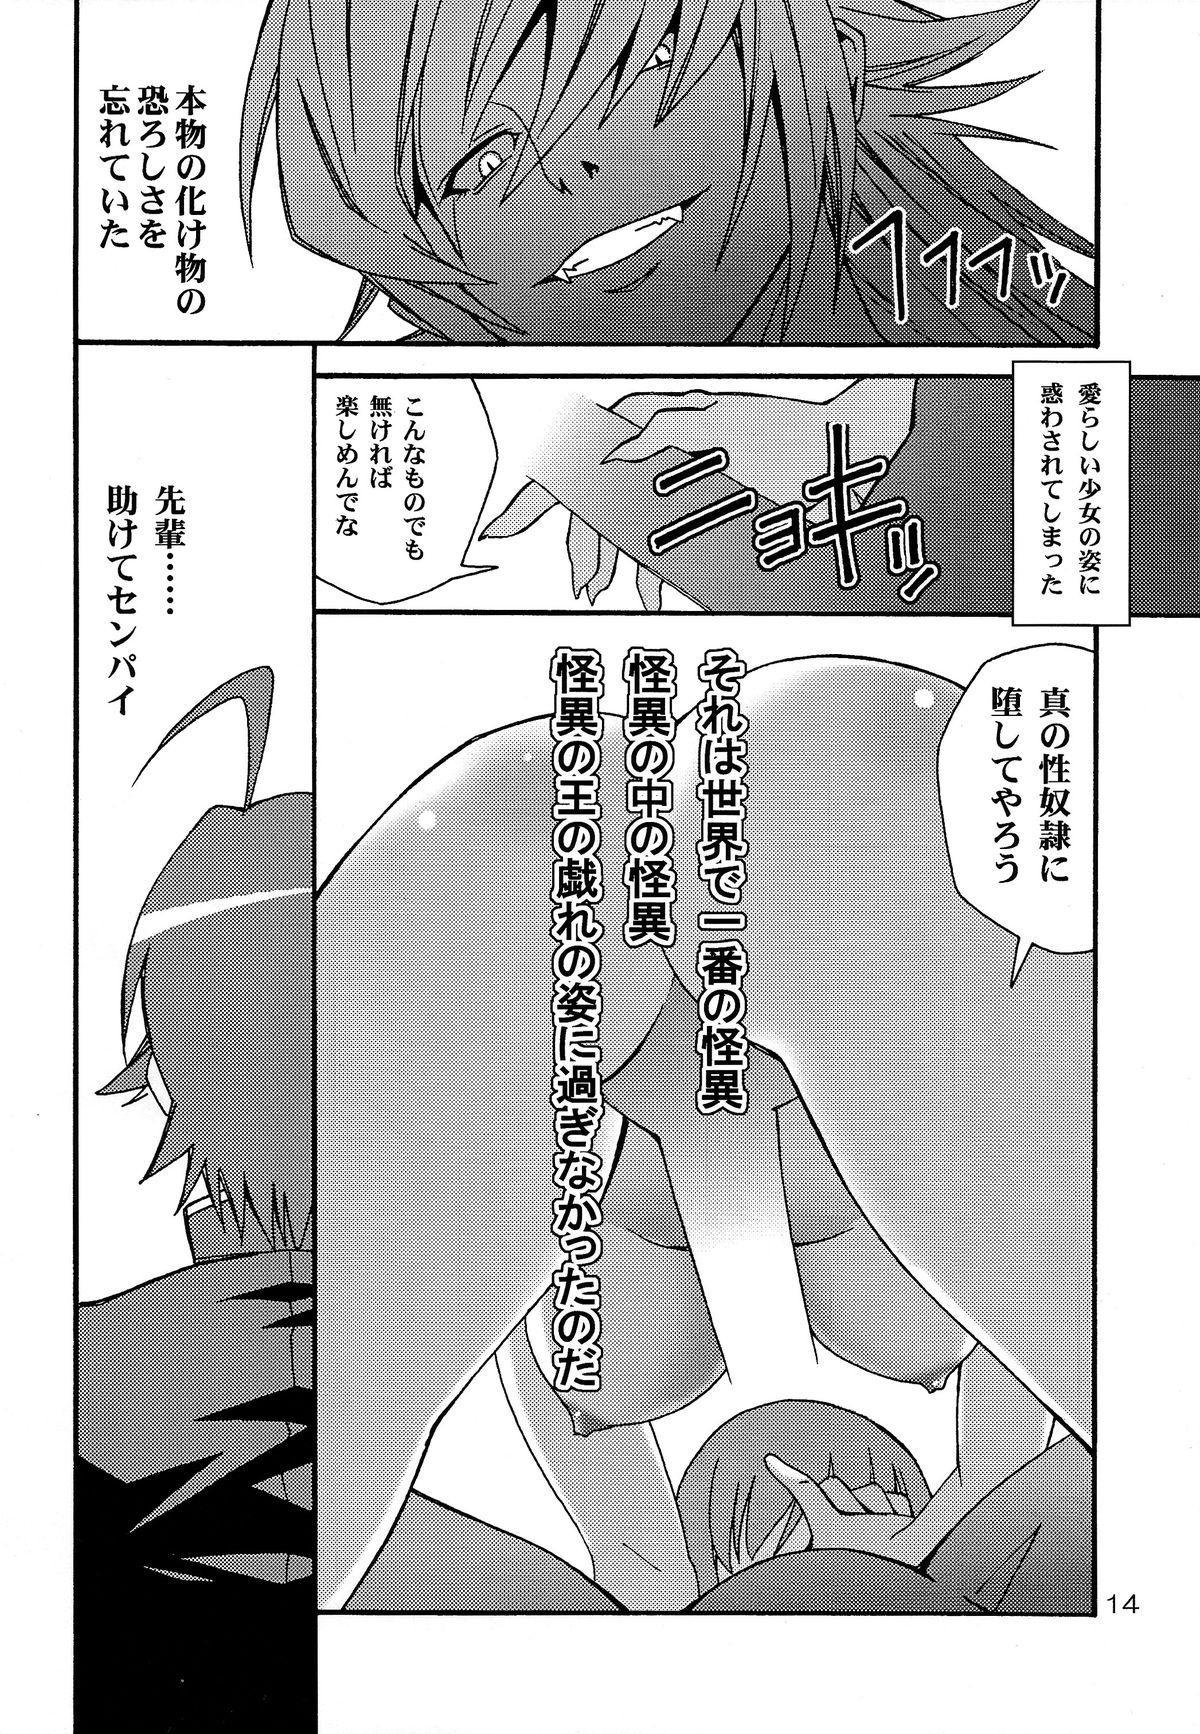 Ha no Monogatari 2014-nen Kanzenban 13